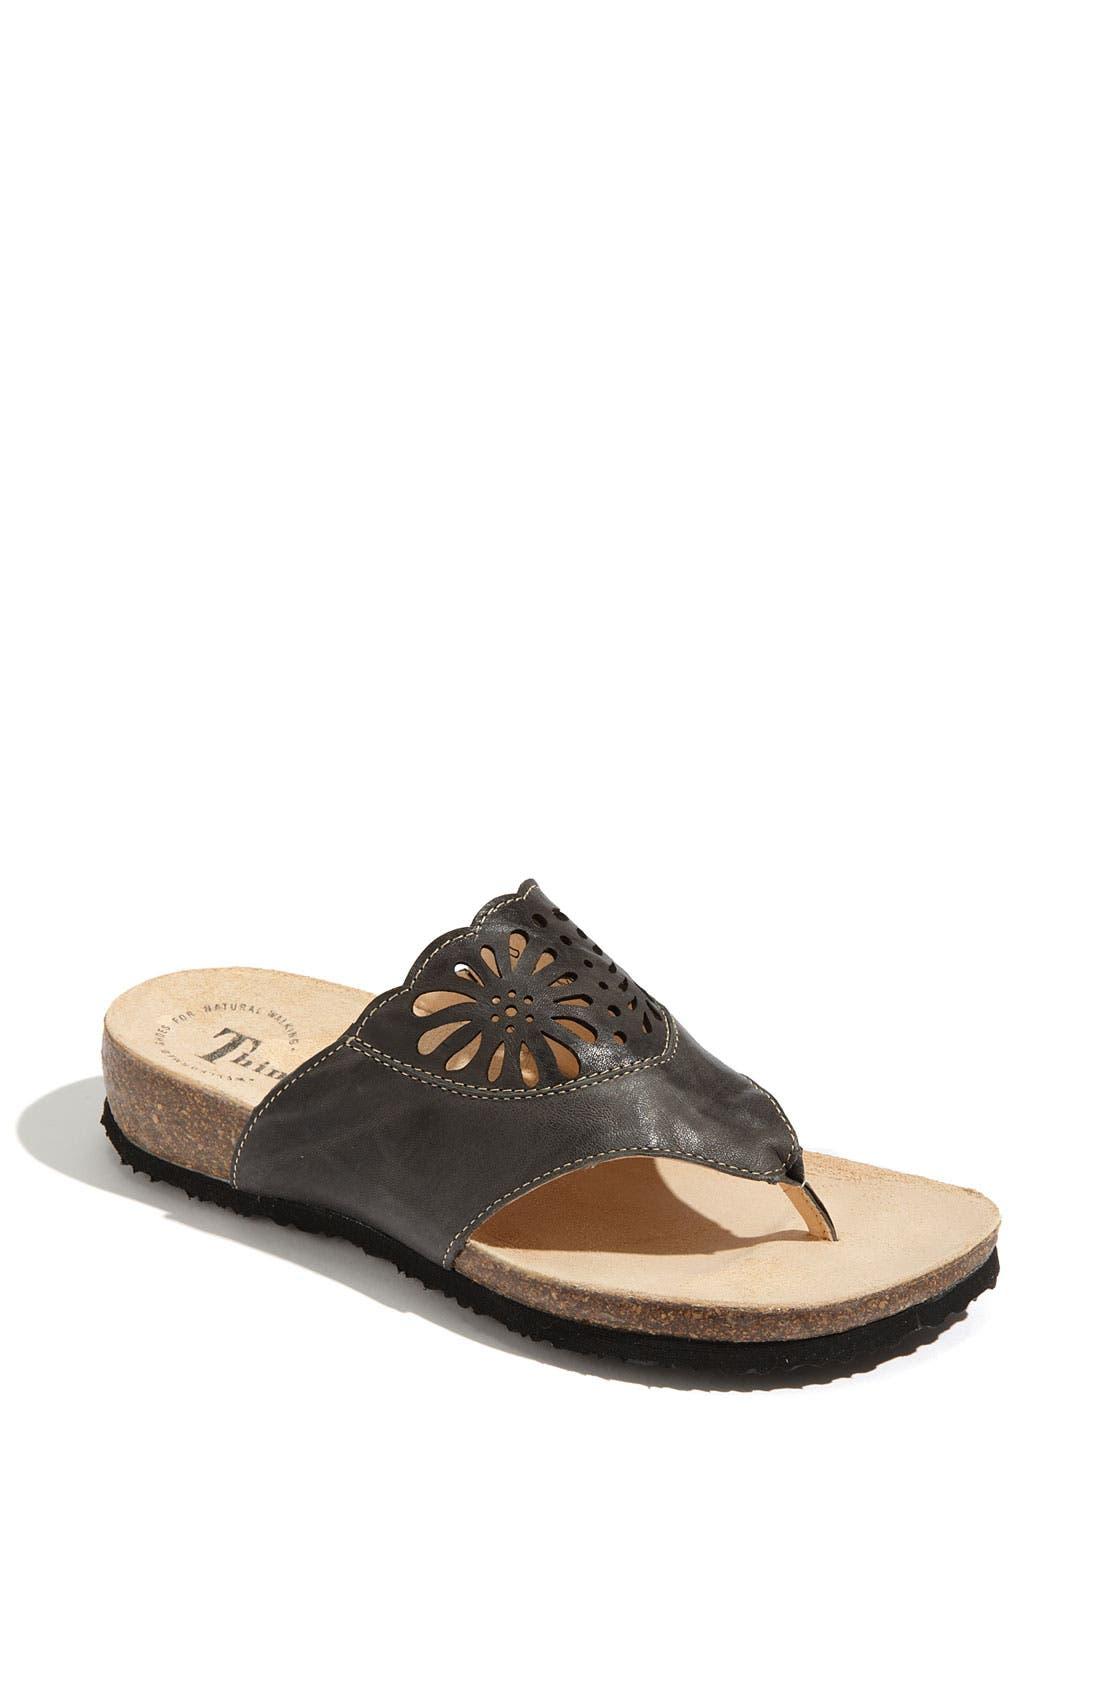 Main Image - Think! 'Julia' Thong Sandal